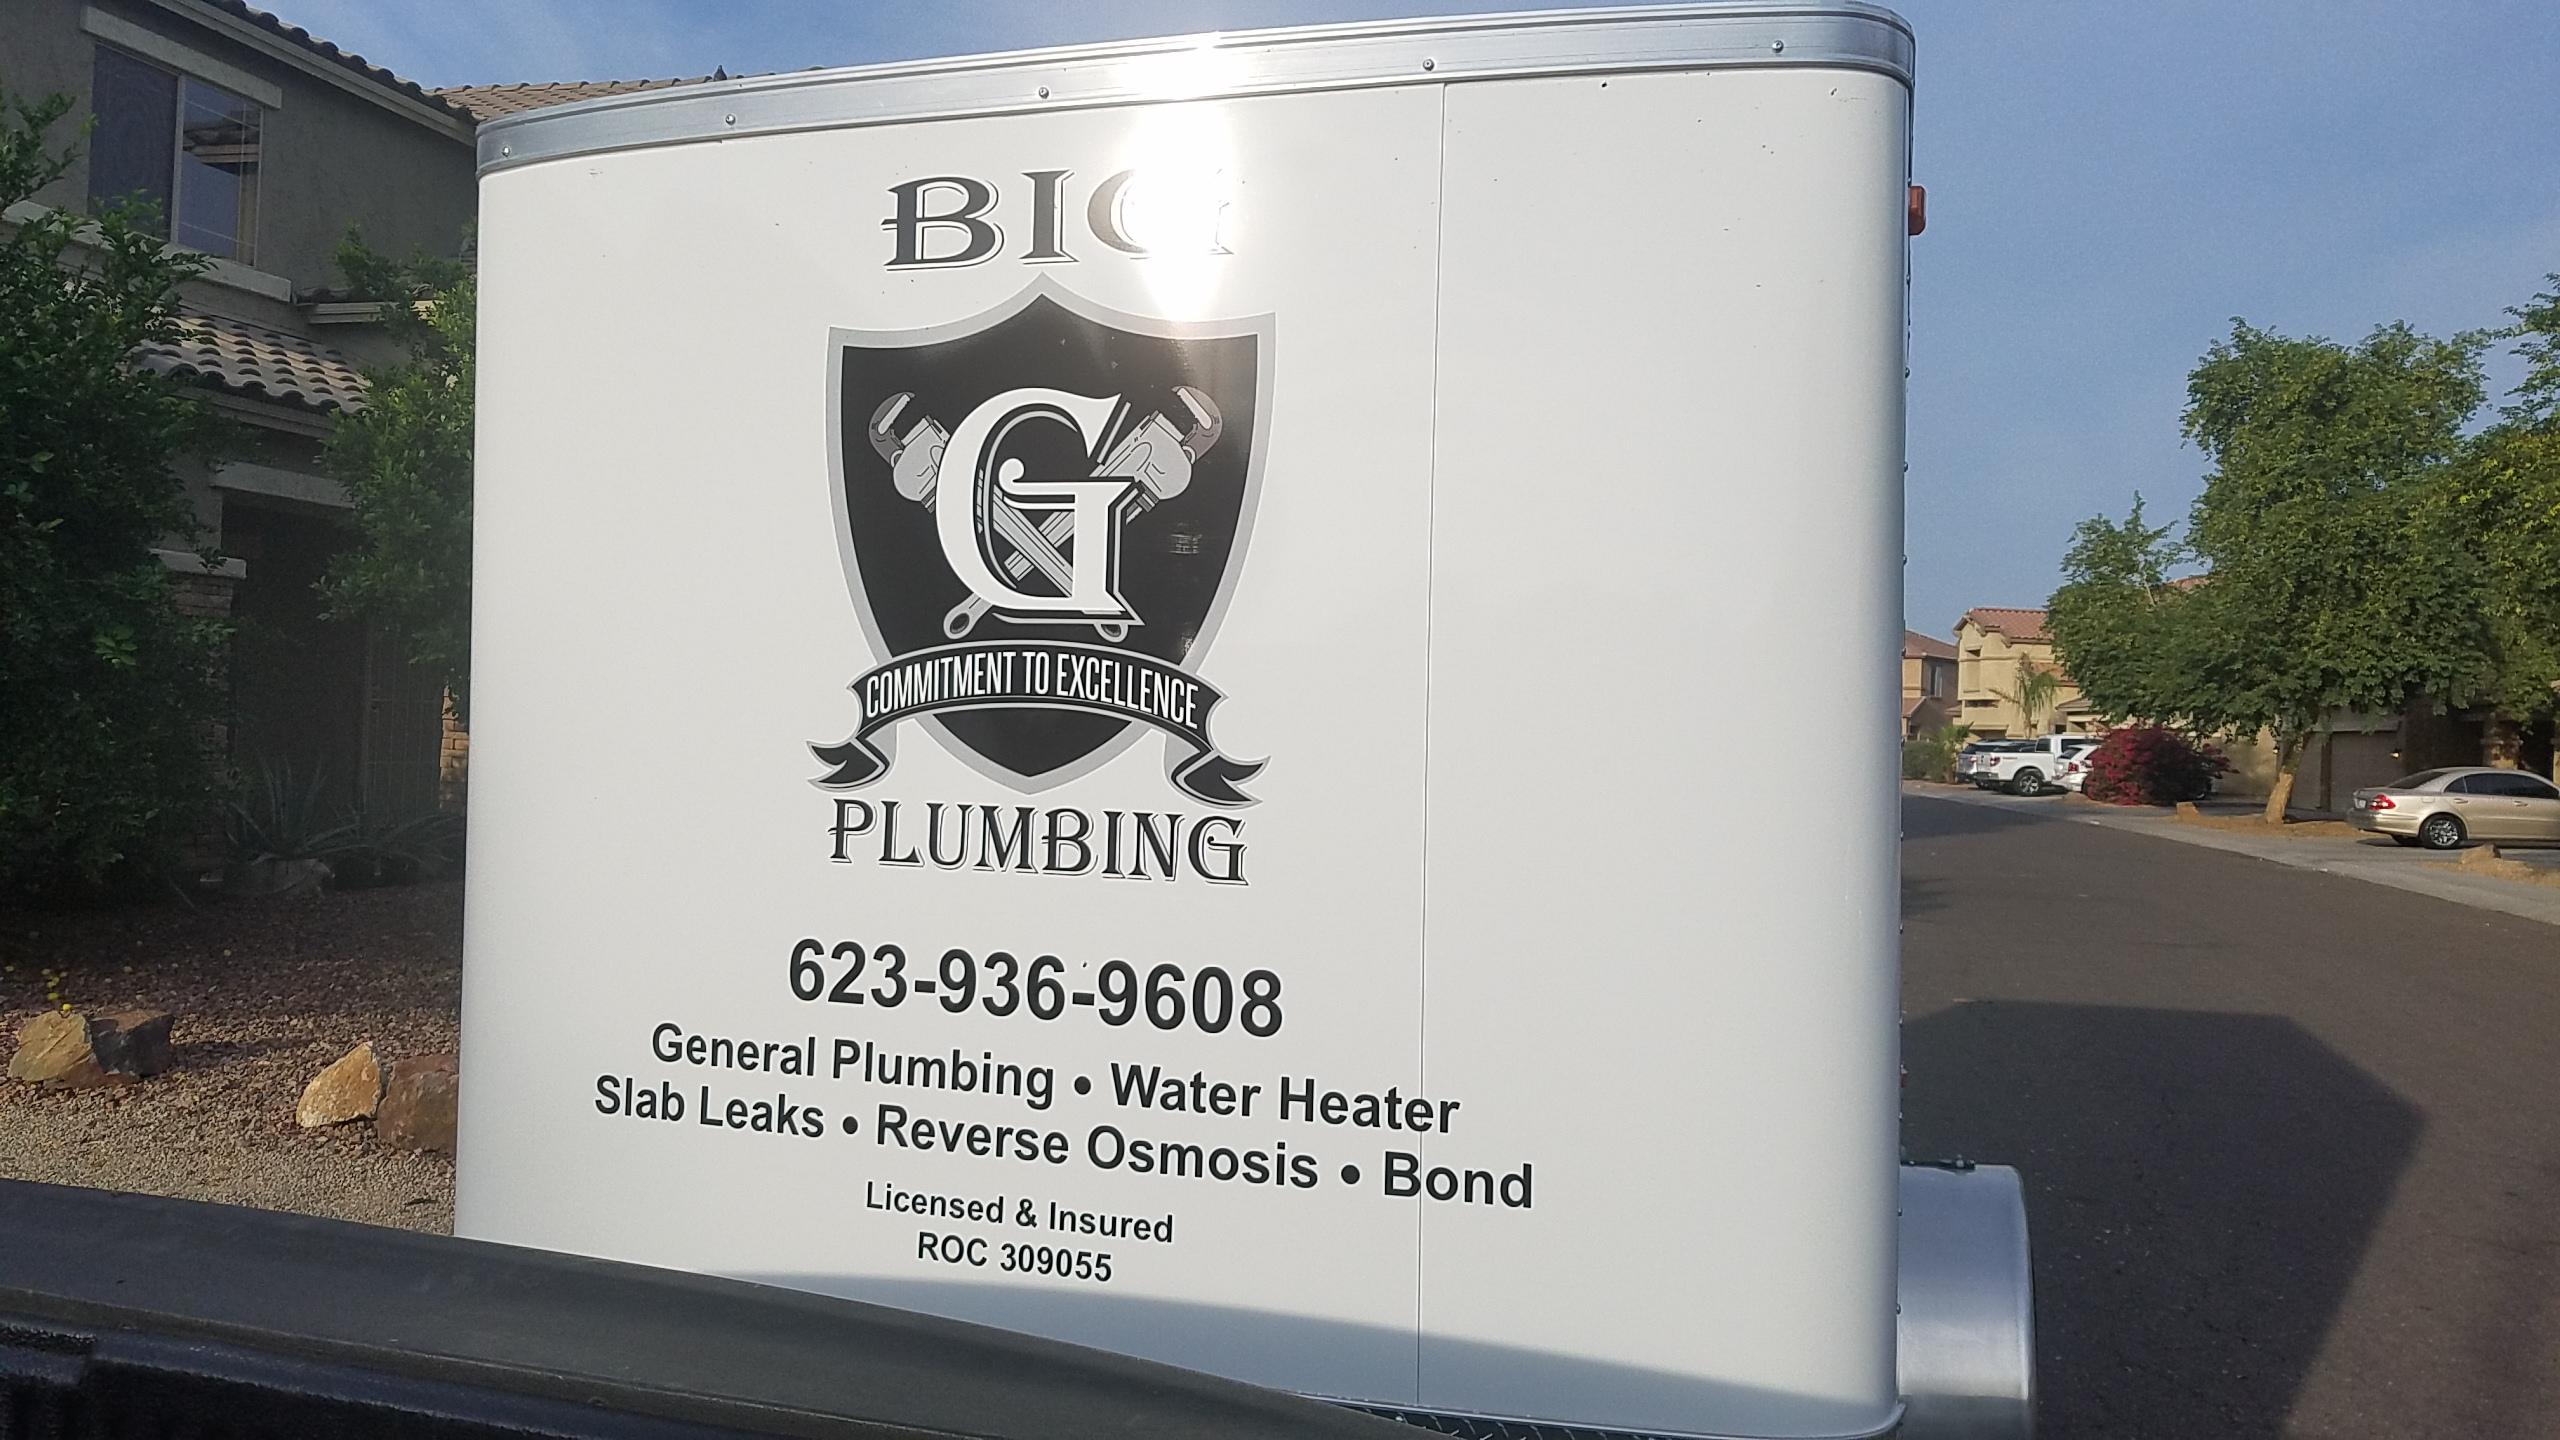 Big G Plumbing LLC image 1